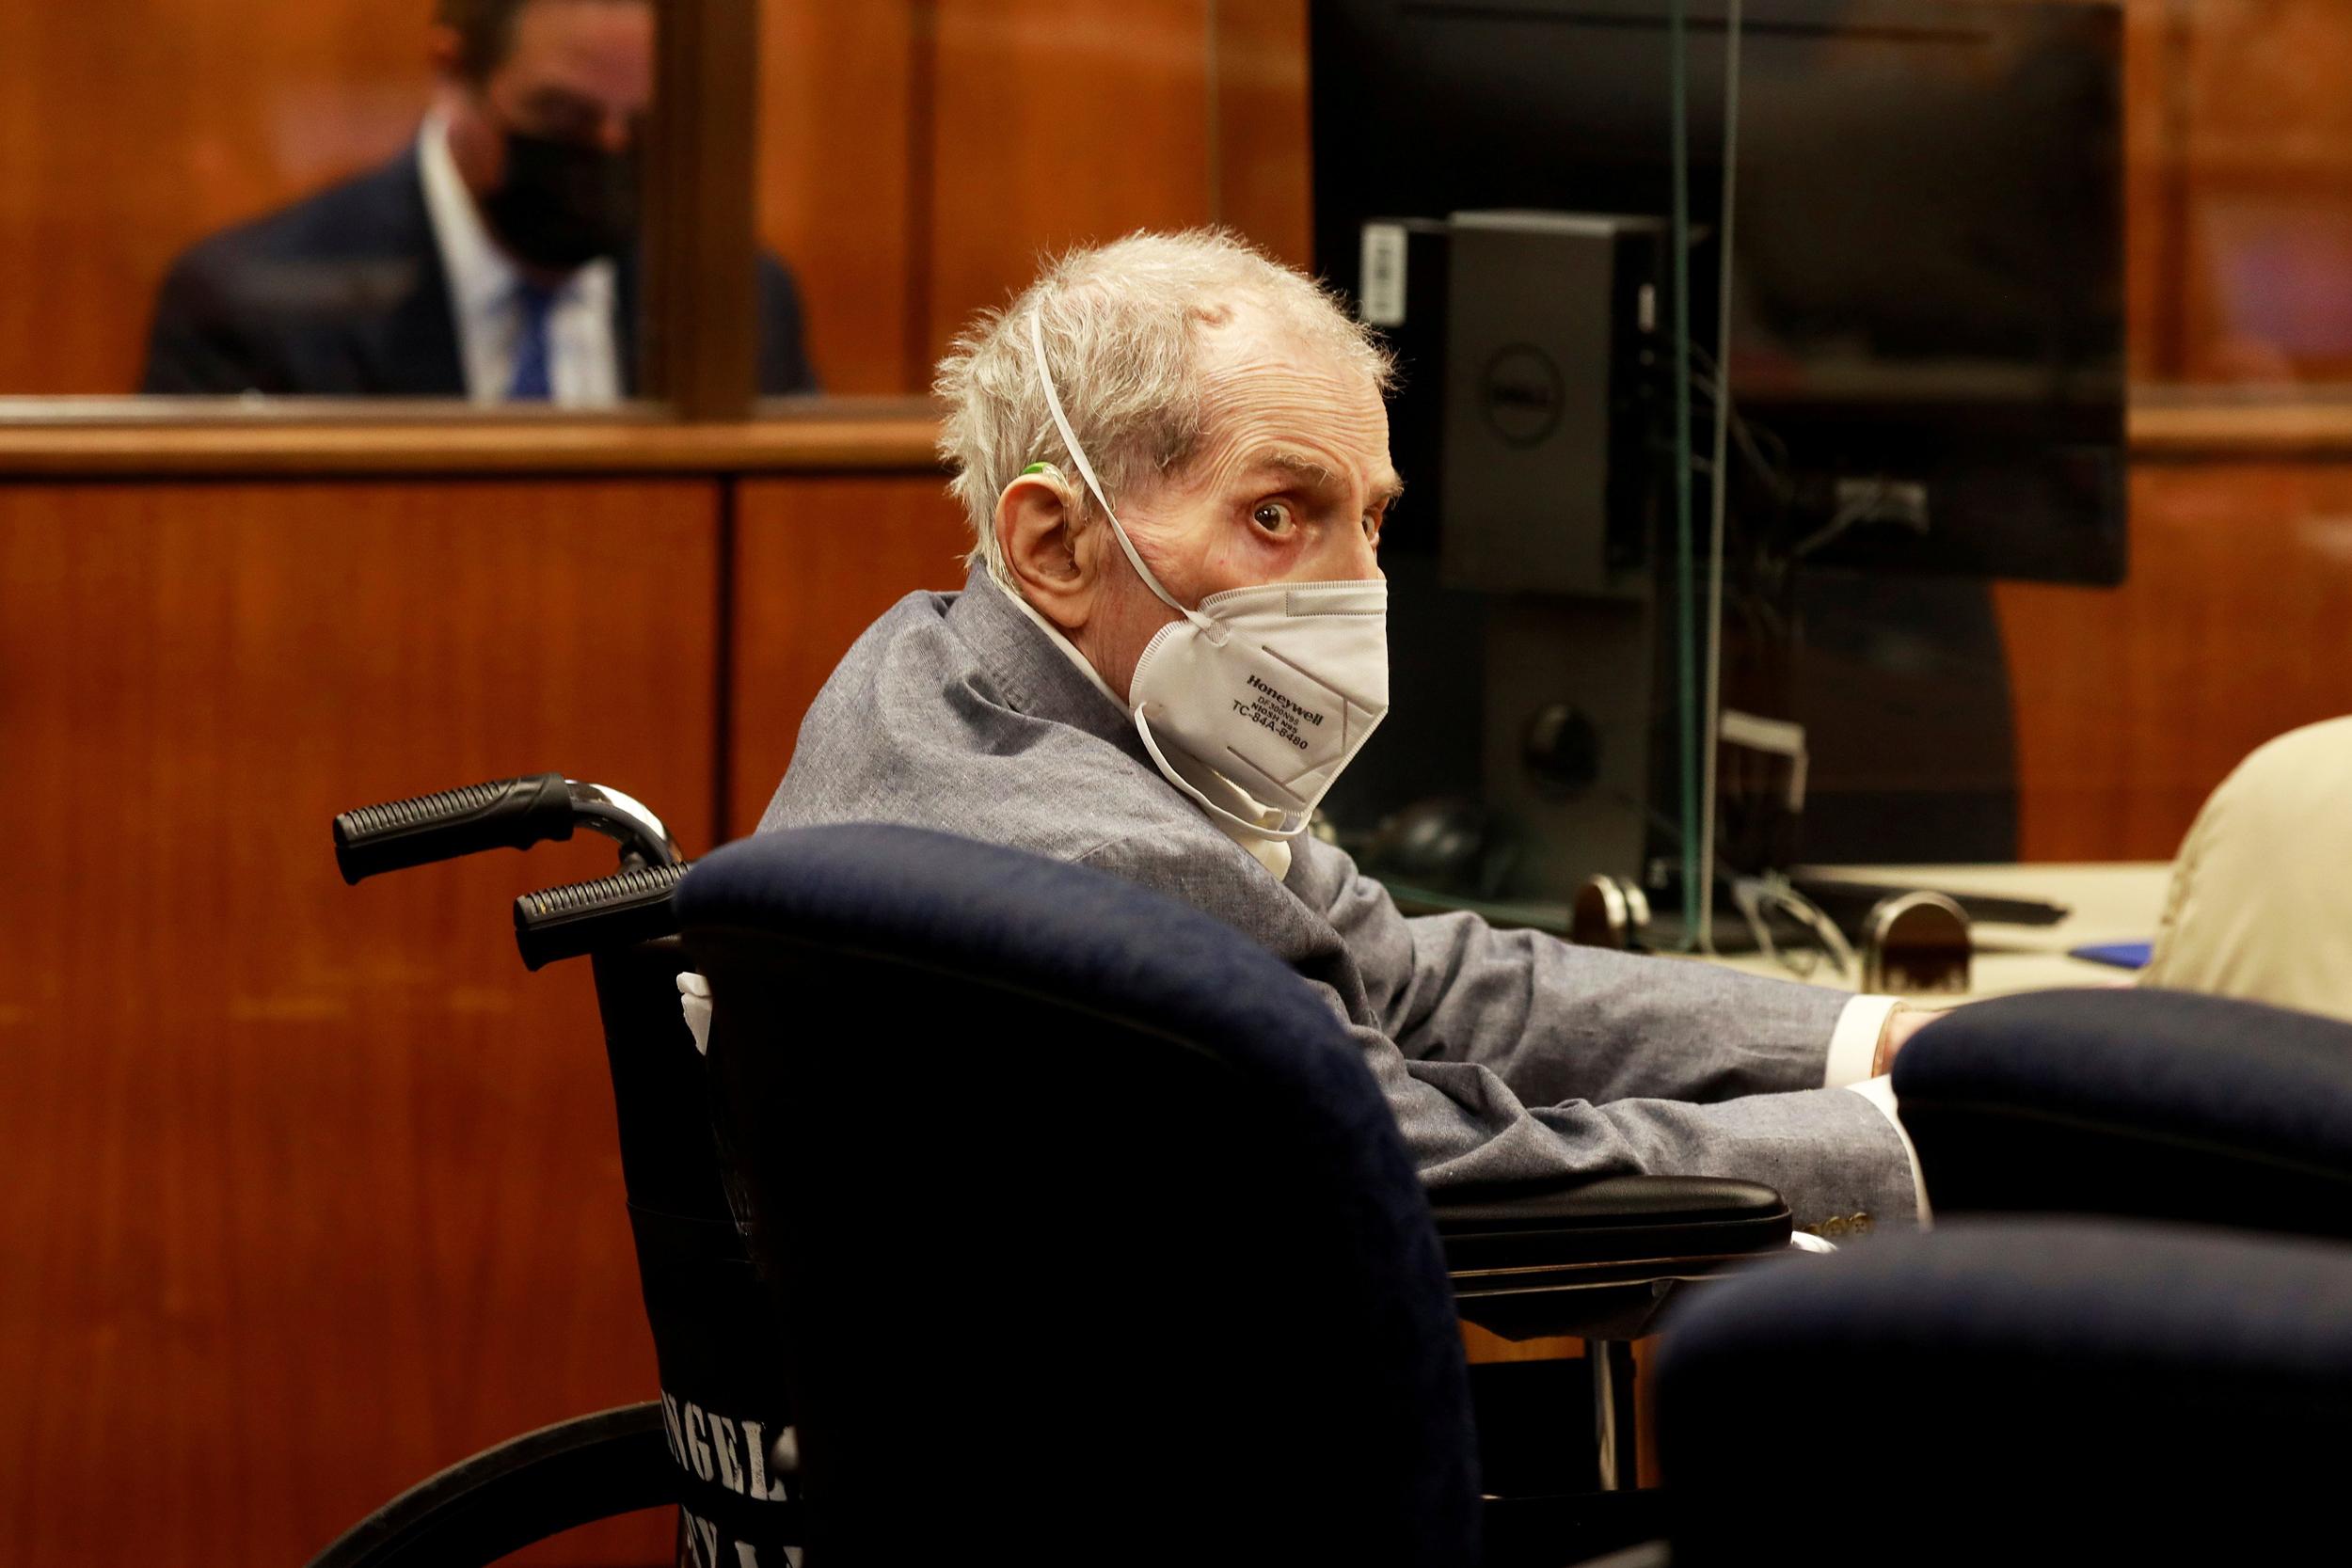 Los Angeles jurors convict Robert Durst of killing friend in 2000